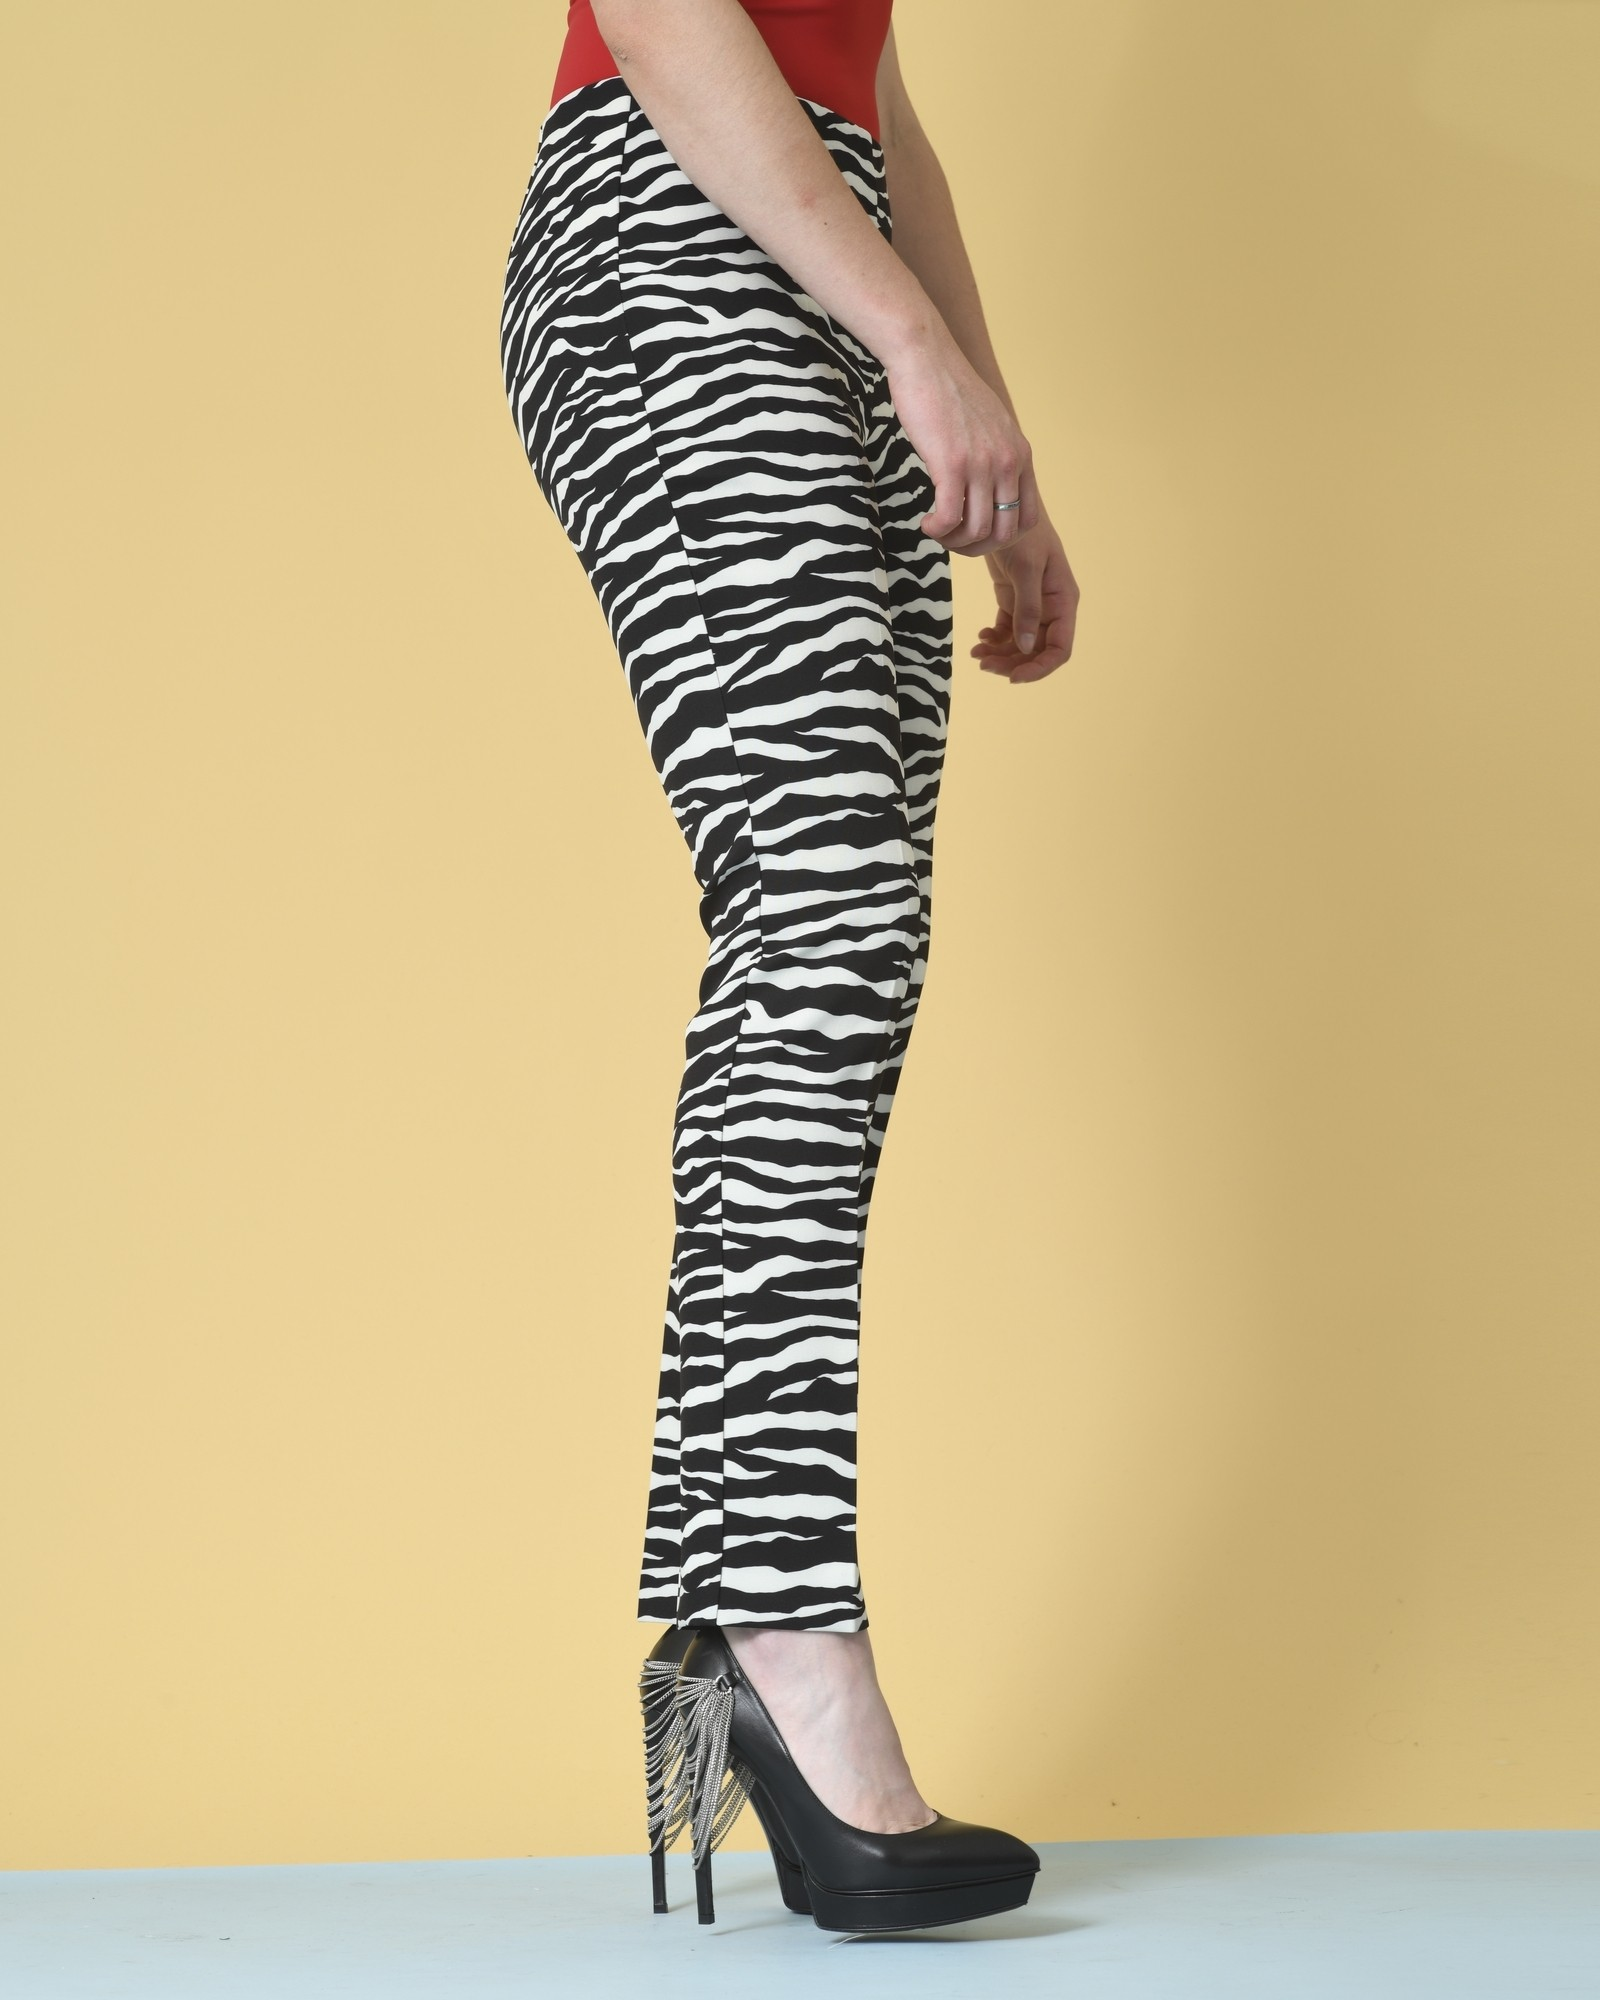 Pantalon slim à imprimé zèbre P.A.R.O.S.H